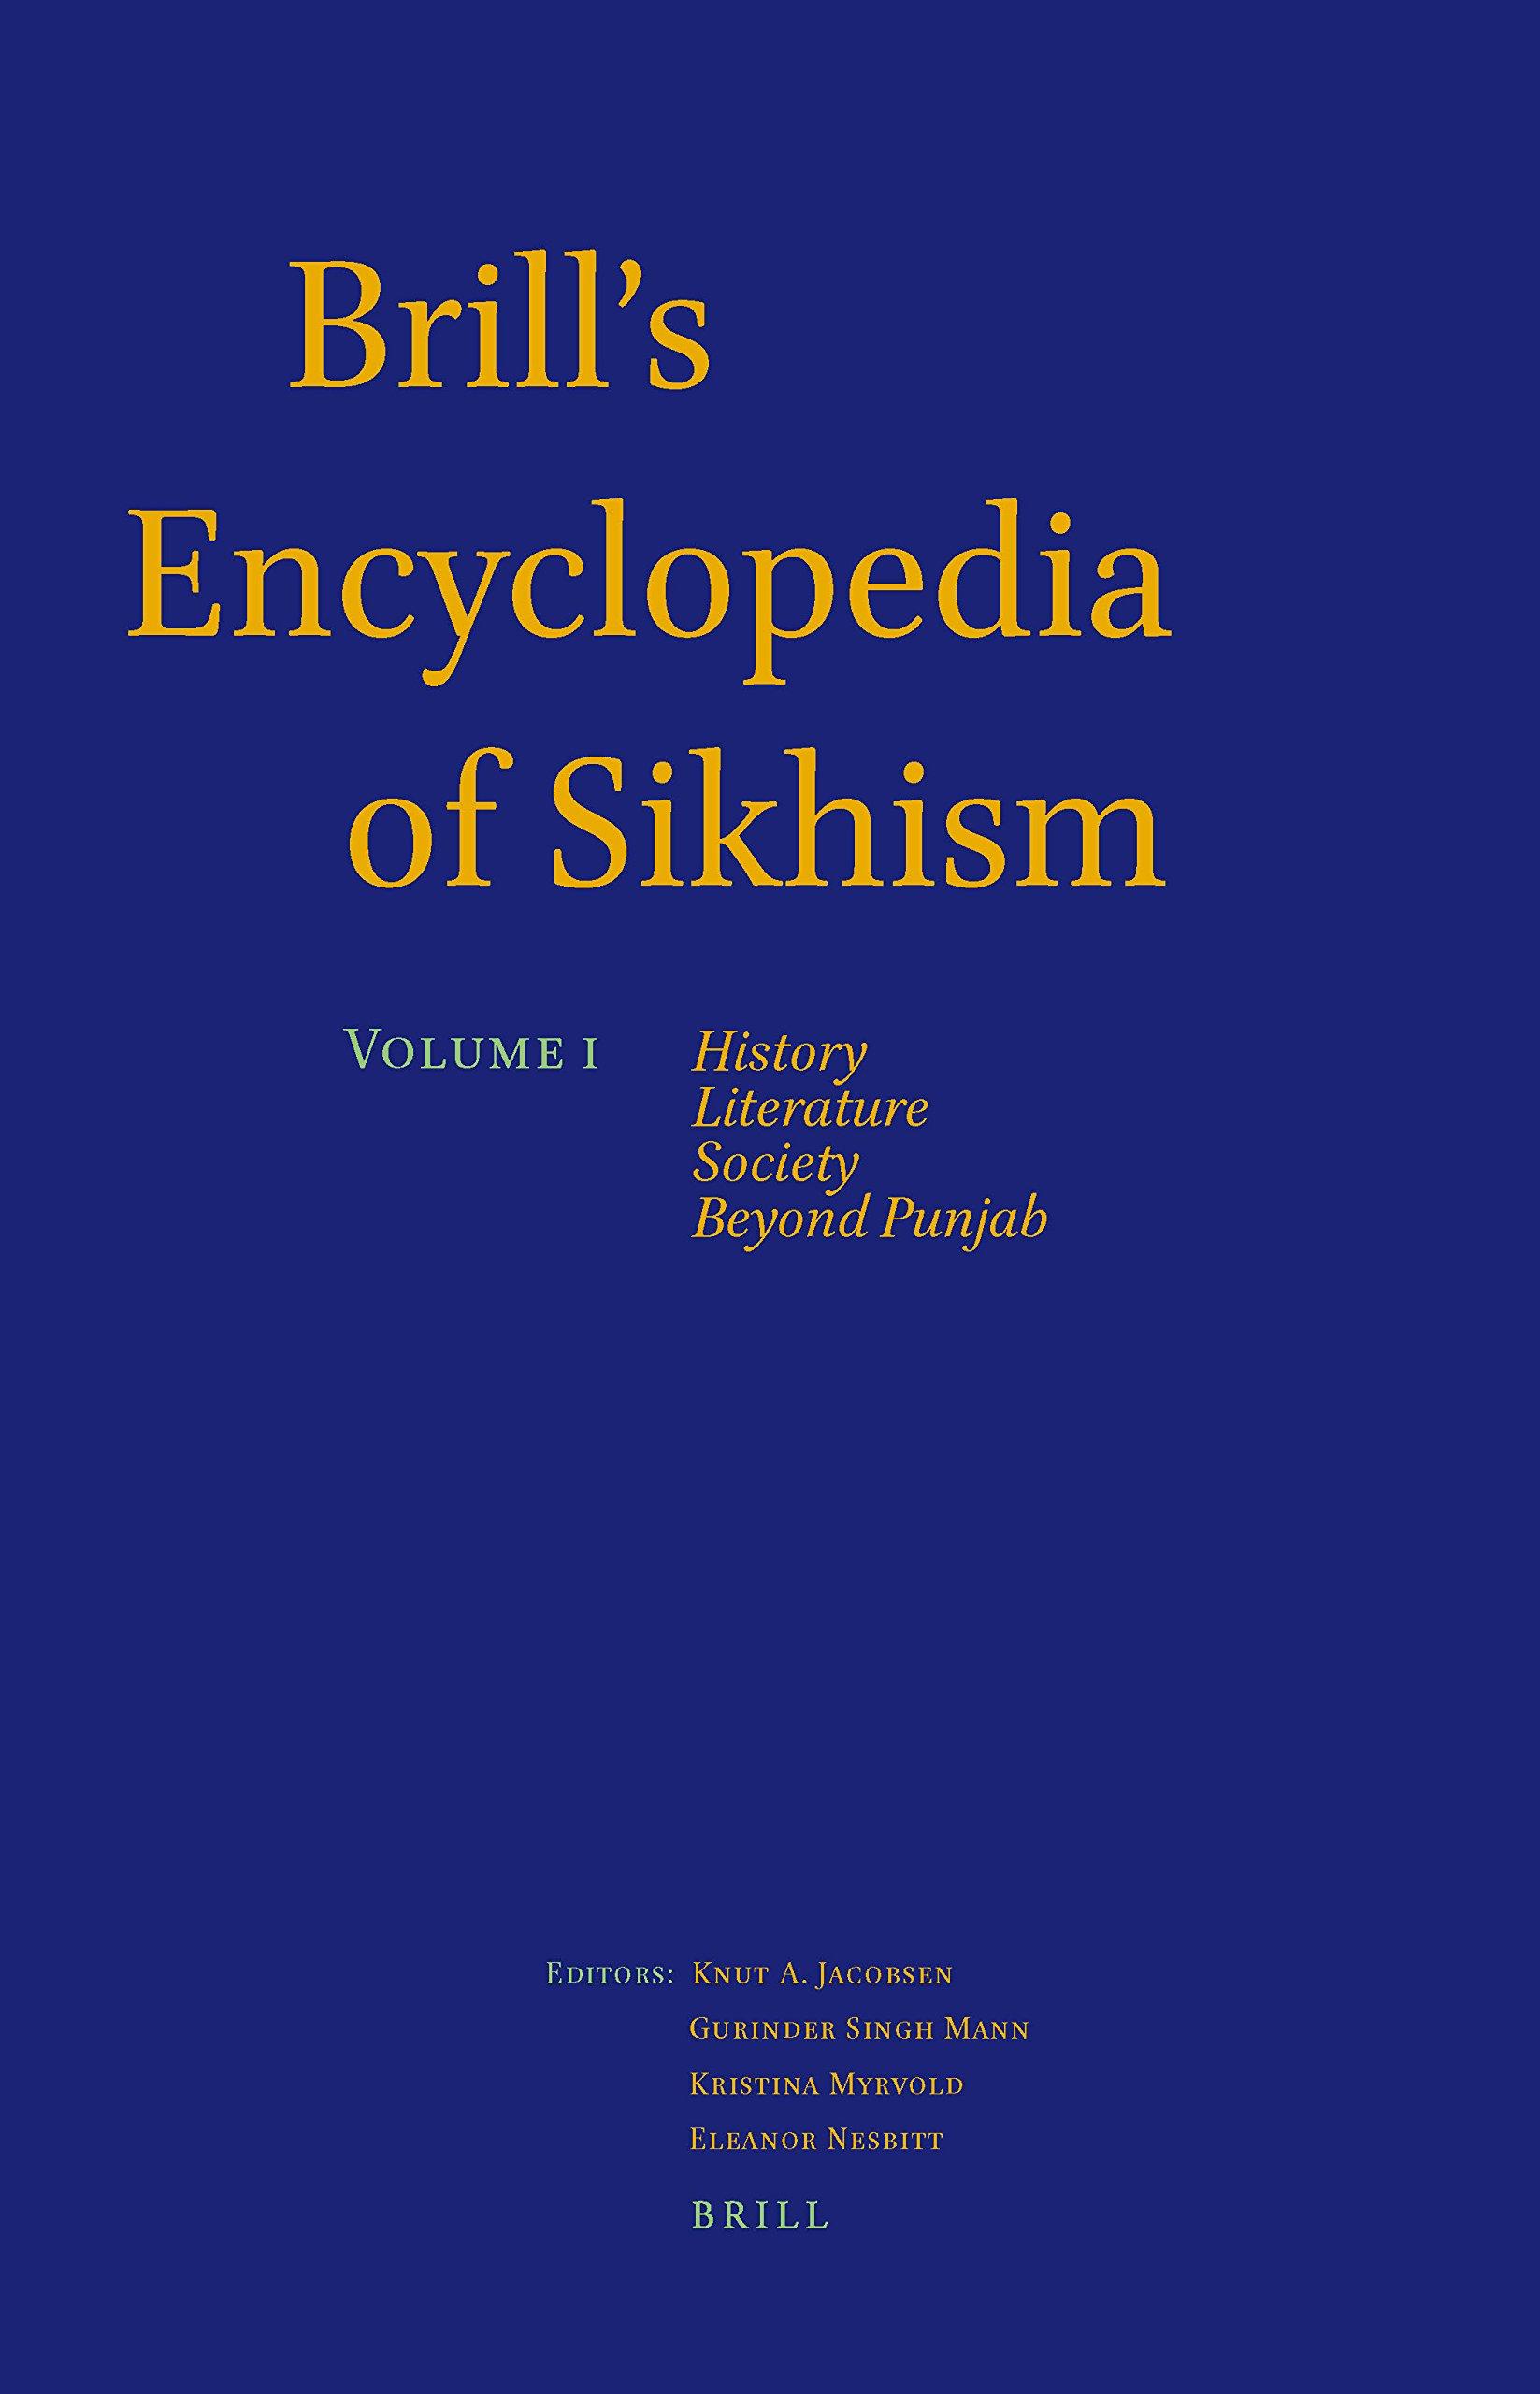 Brill's Encyclopedia of Sikhism, Volume 1, History, Literature, Society, Beyond Punjab (Handbook of Oriental Studies. Section 2 South Asia) ebook